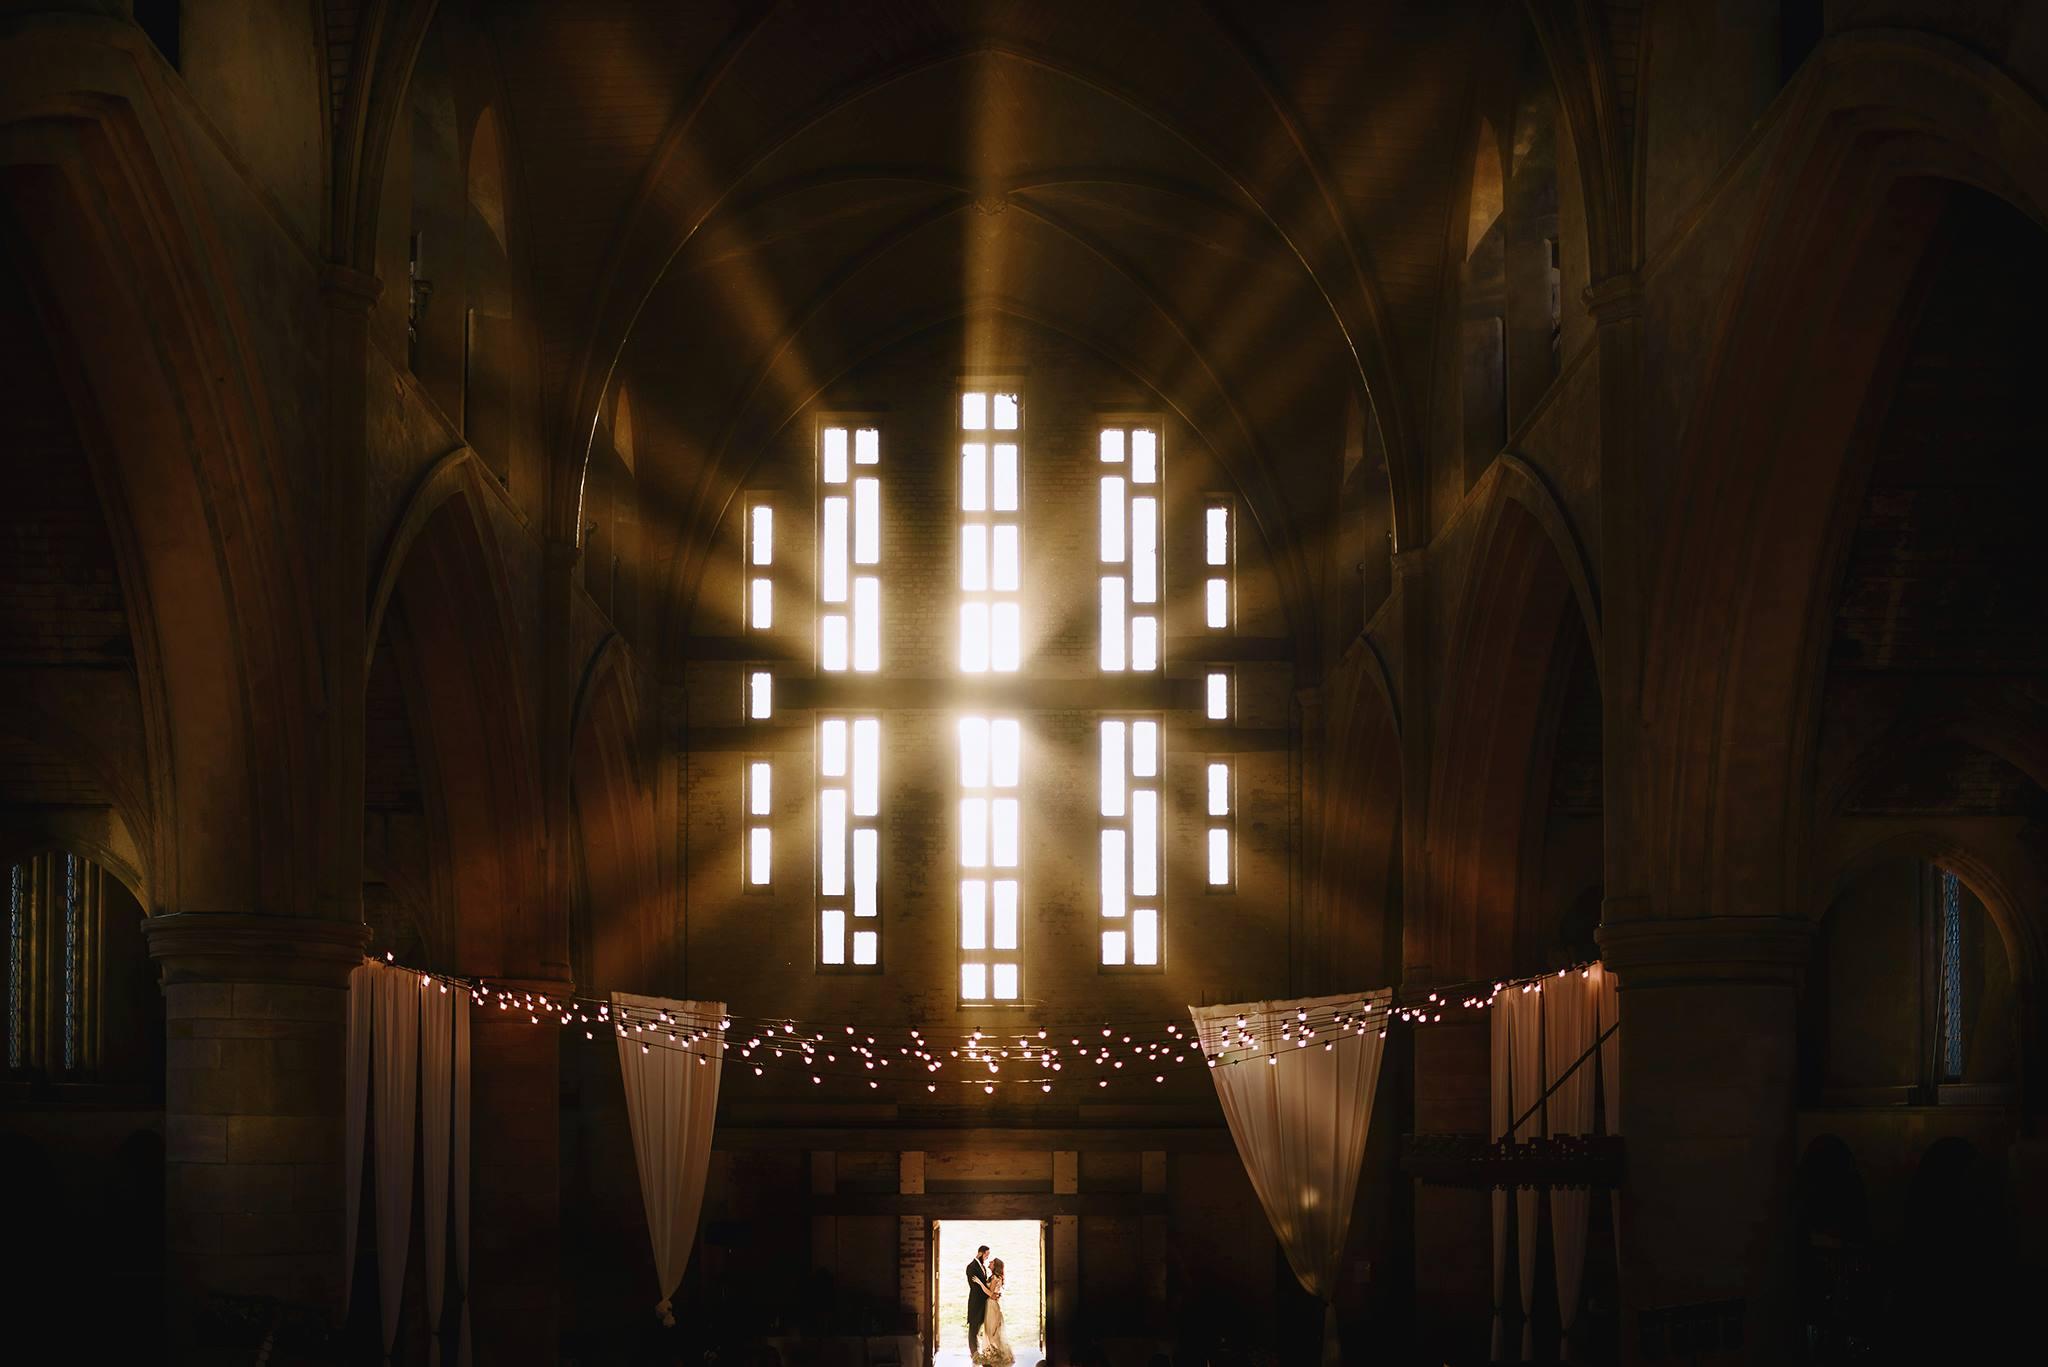 Junebug Best of the Best wedding photographers 2016